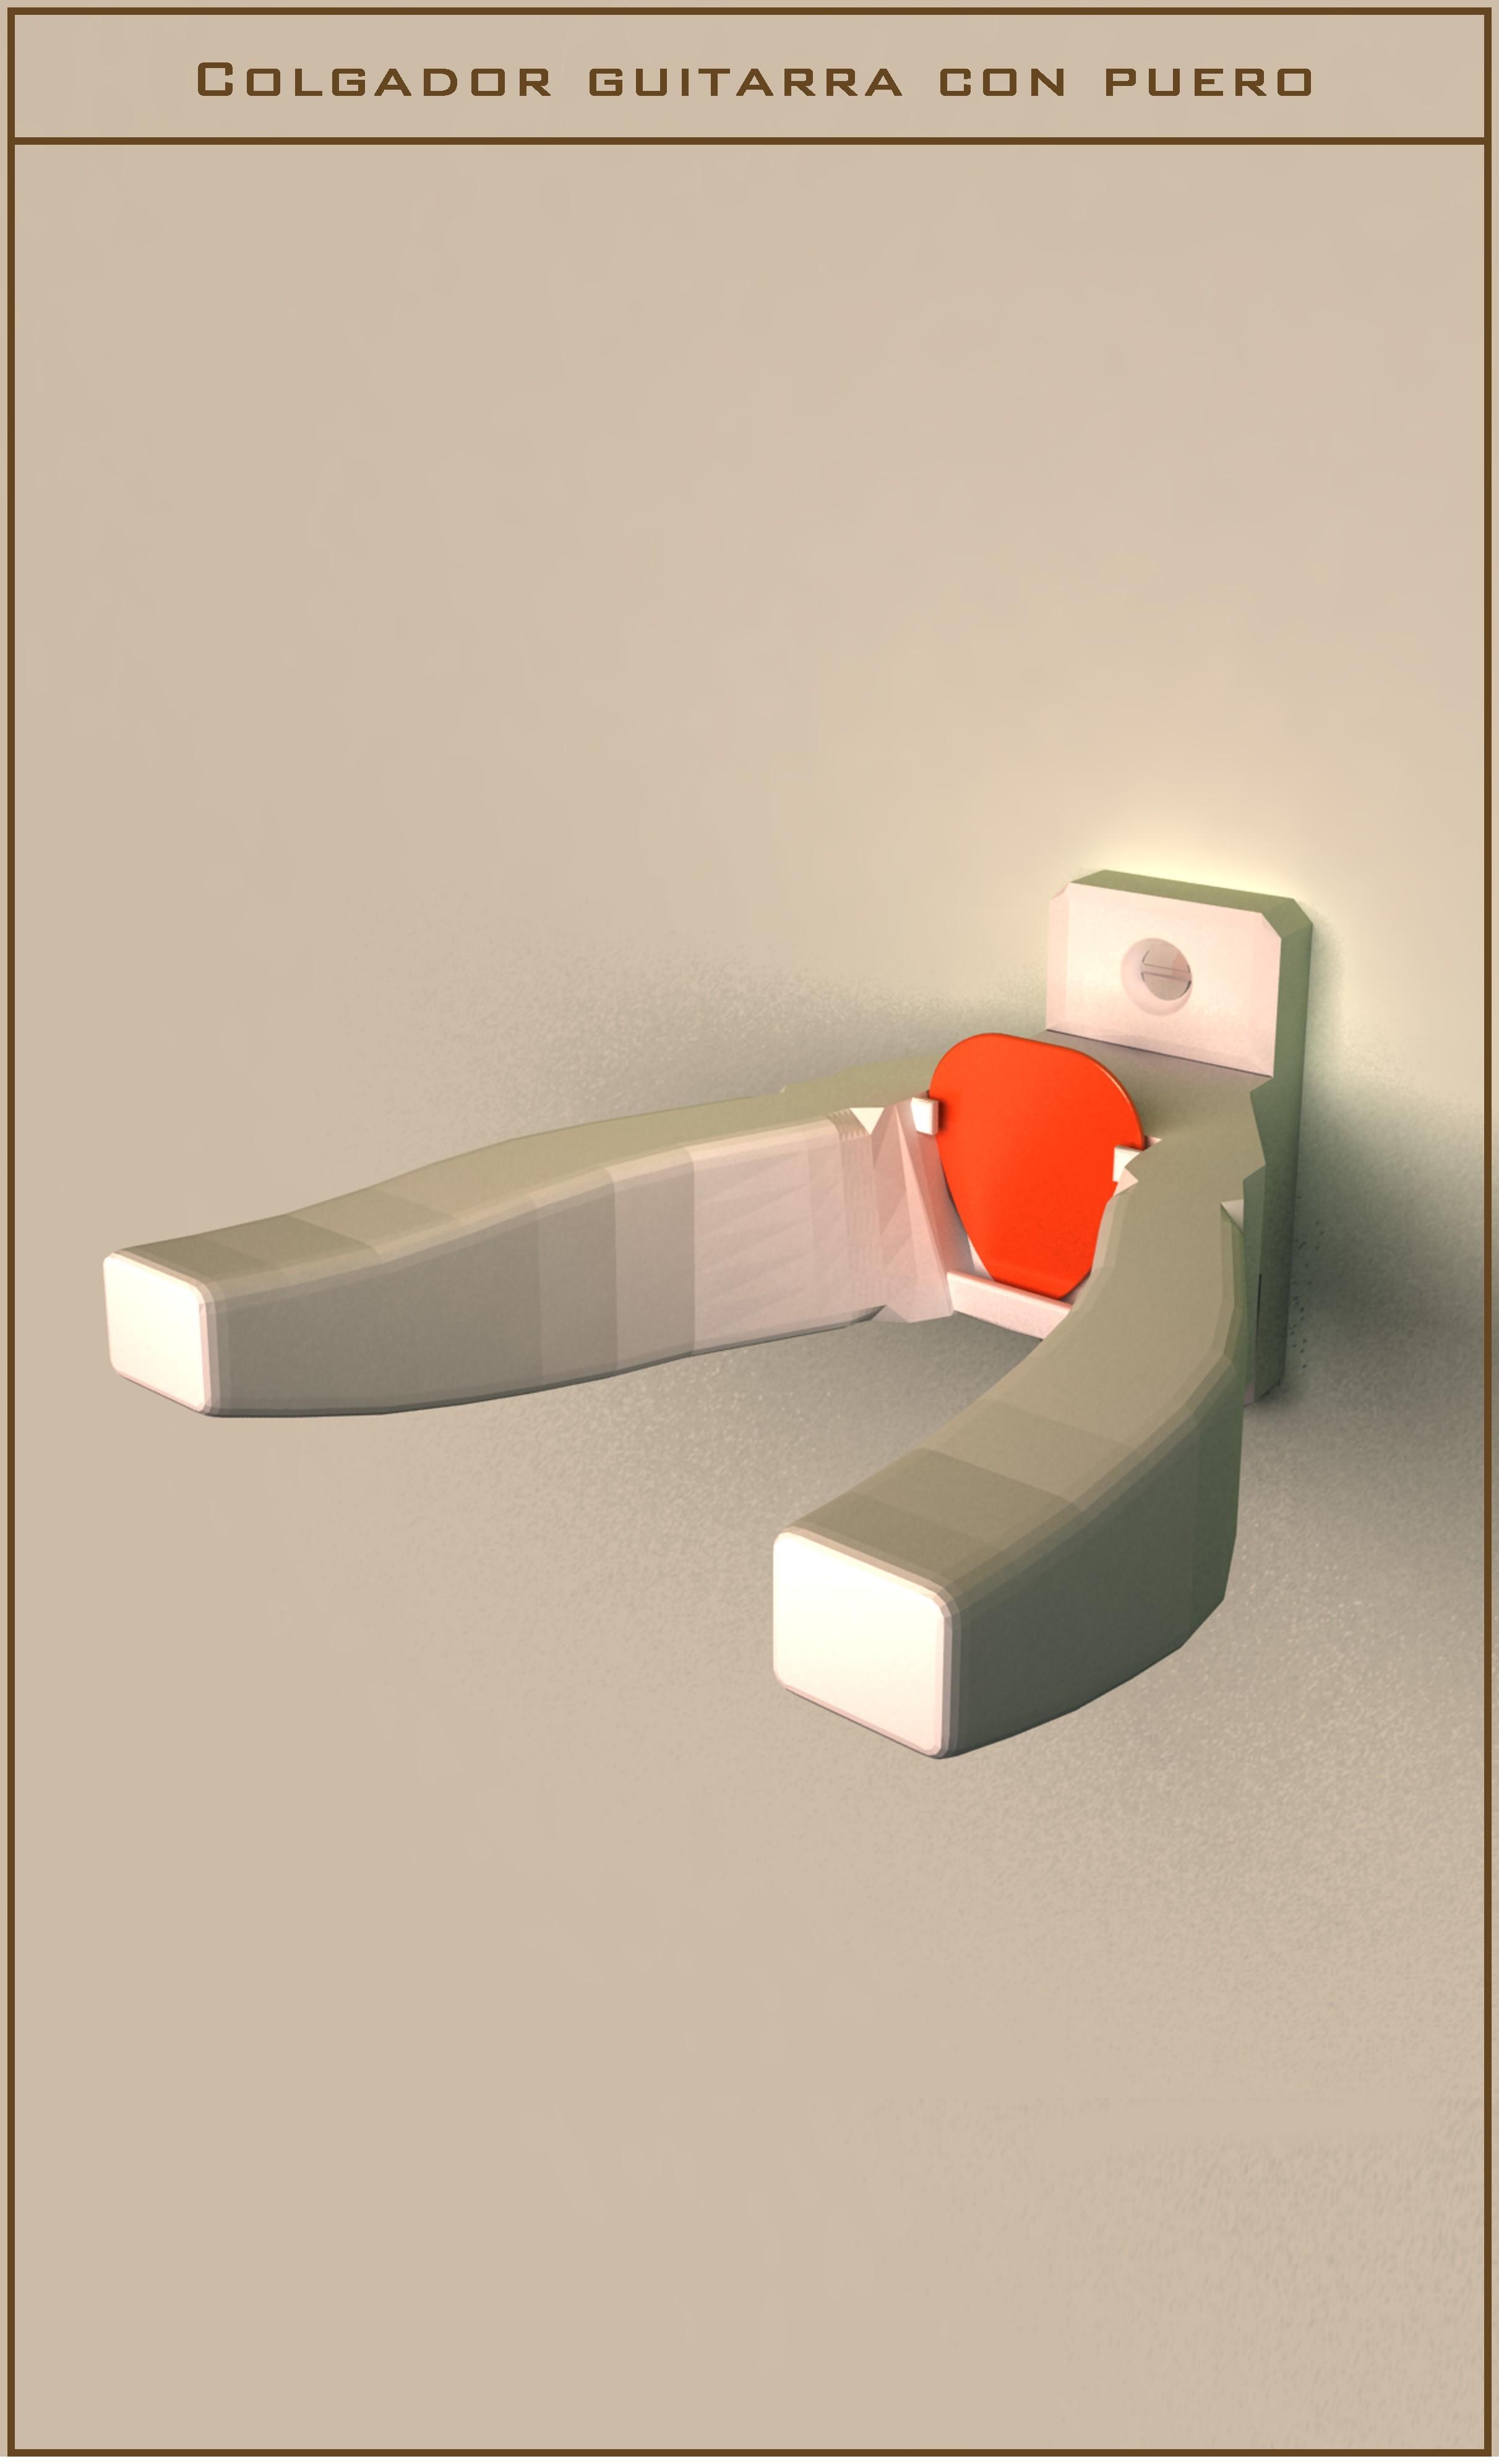 Colgador_02.jpg Download free STL file Guitar hanger with puero • Model to 3D print, danielhuertasperez